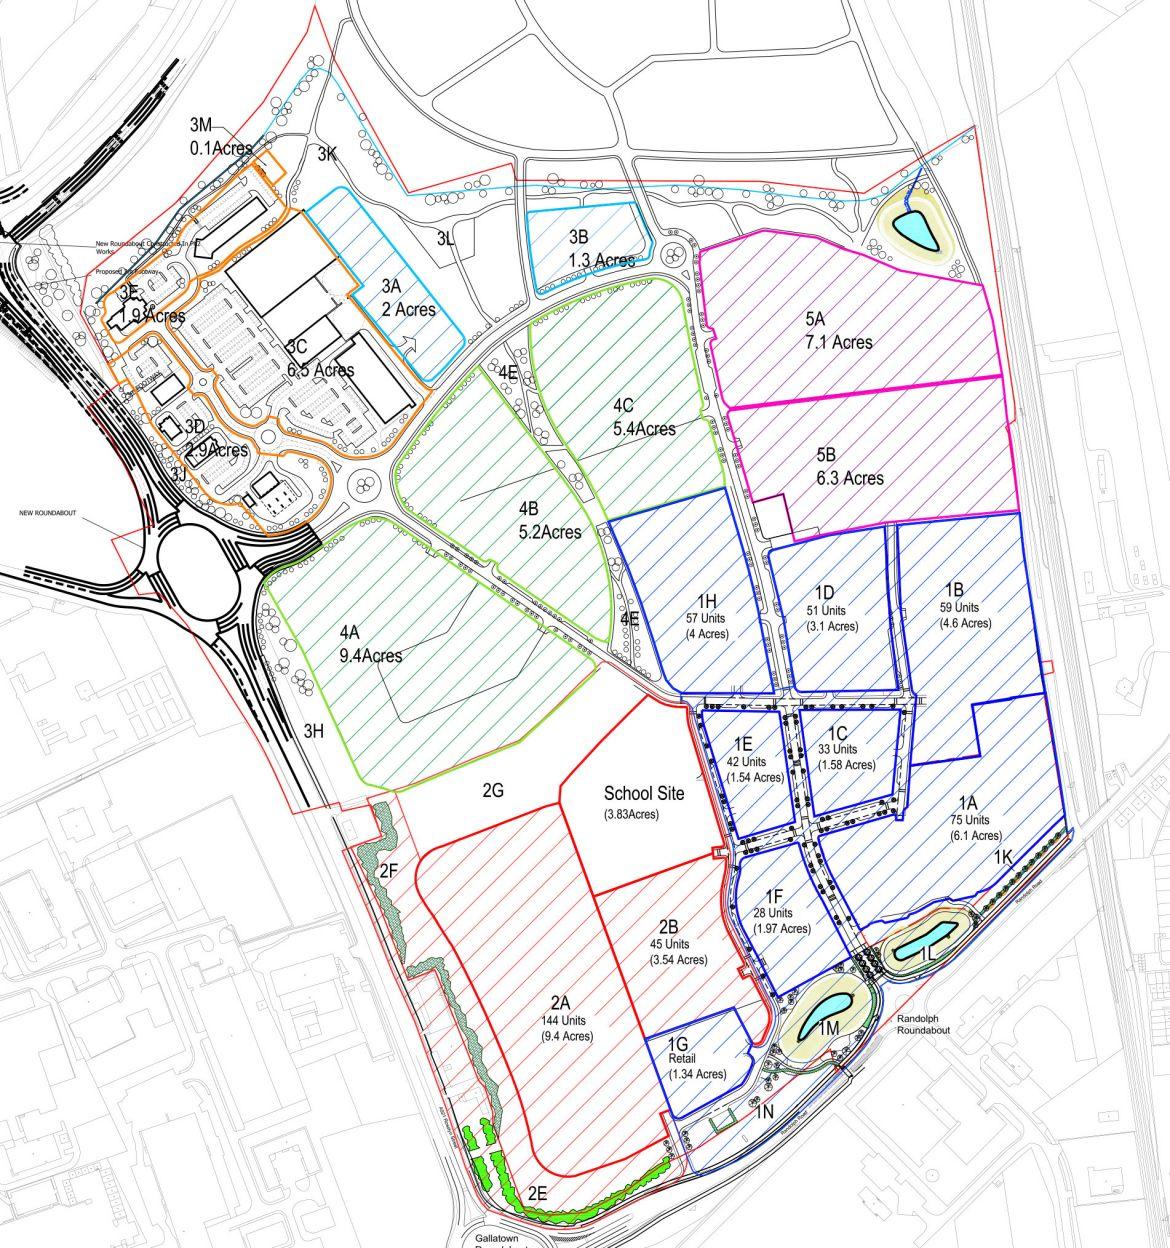 Kingdom Park Phases 3 - 5